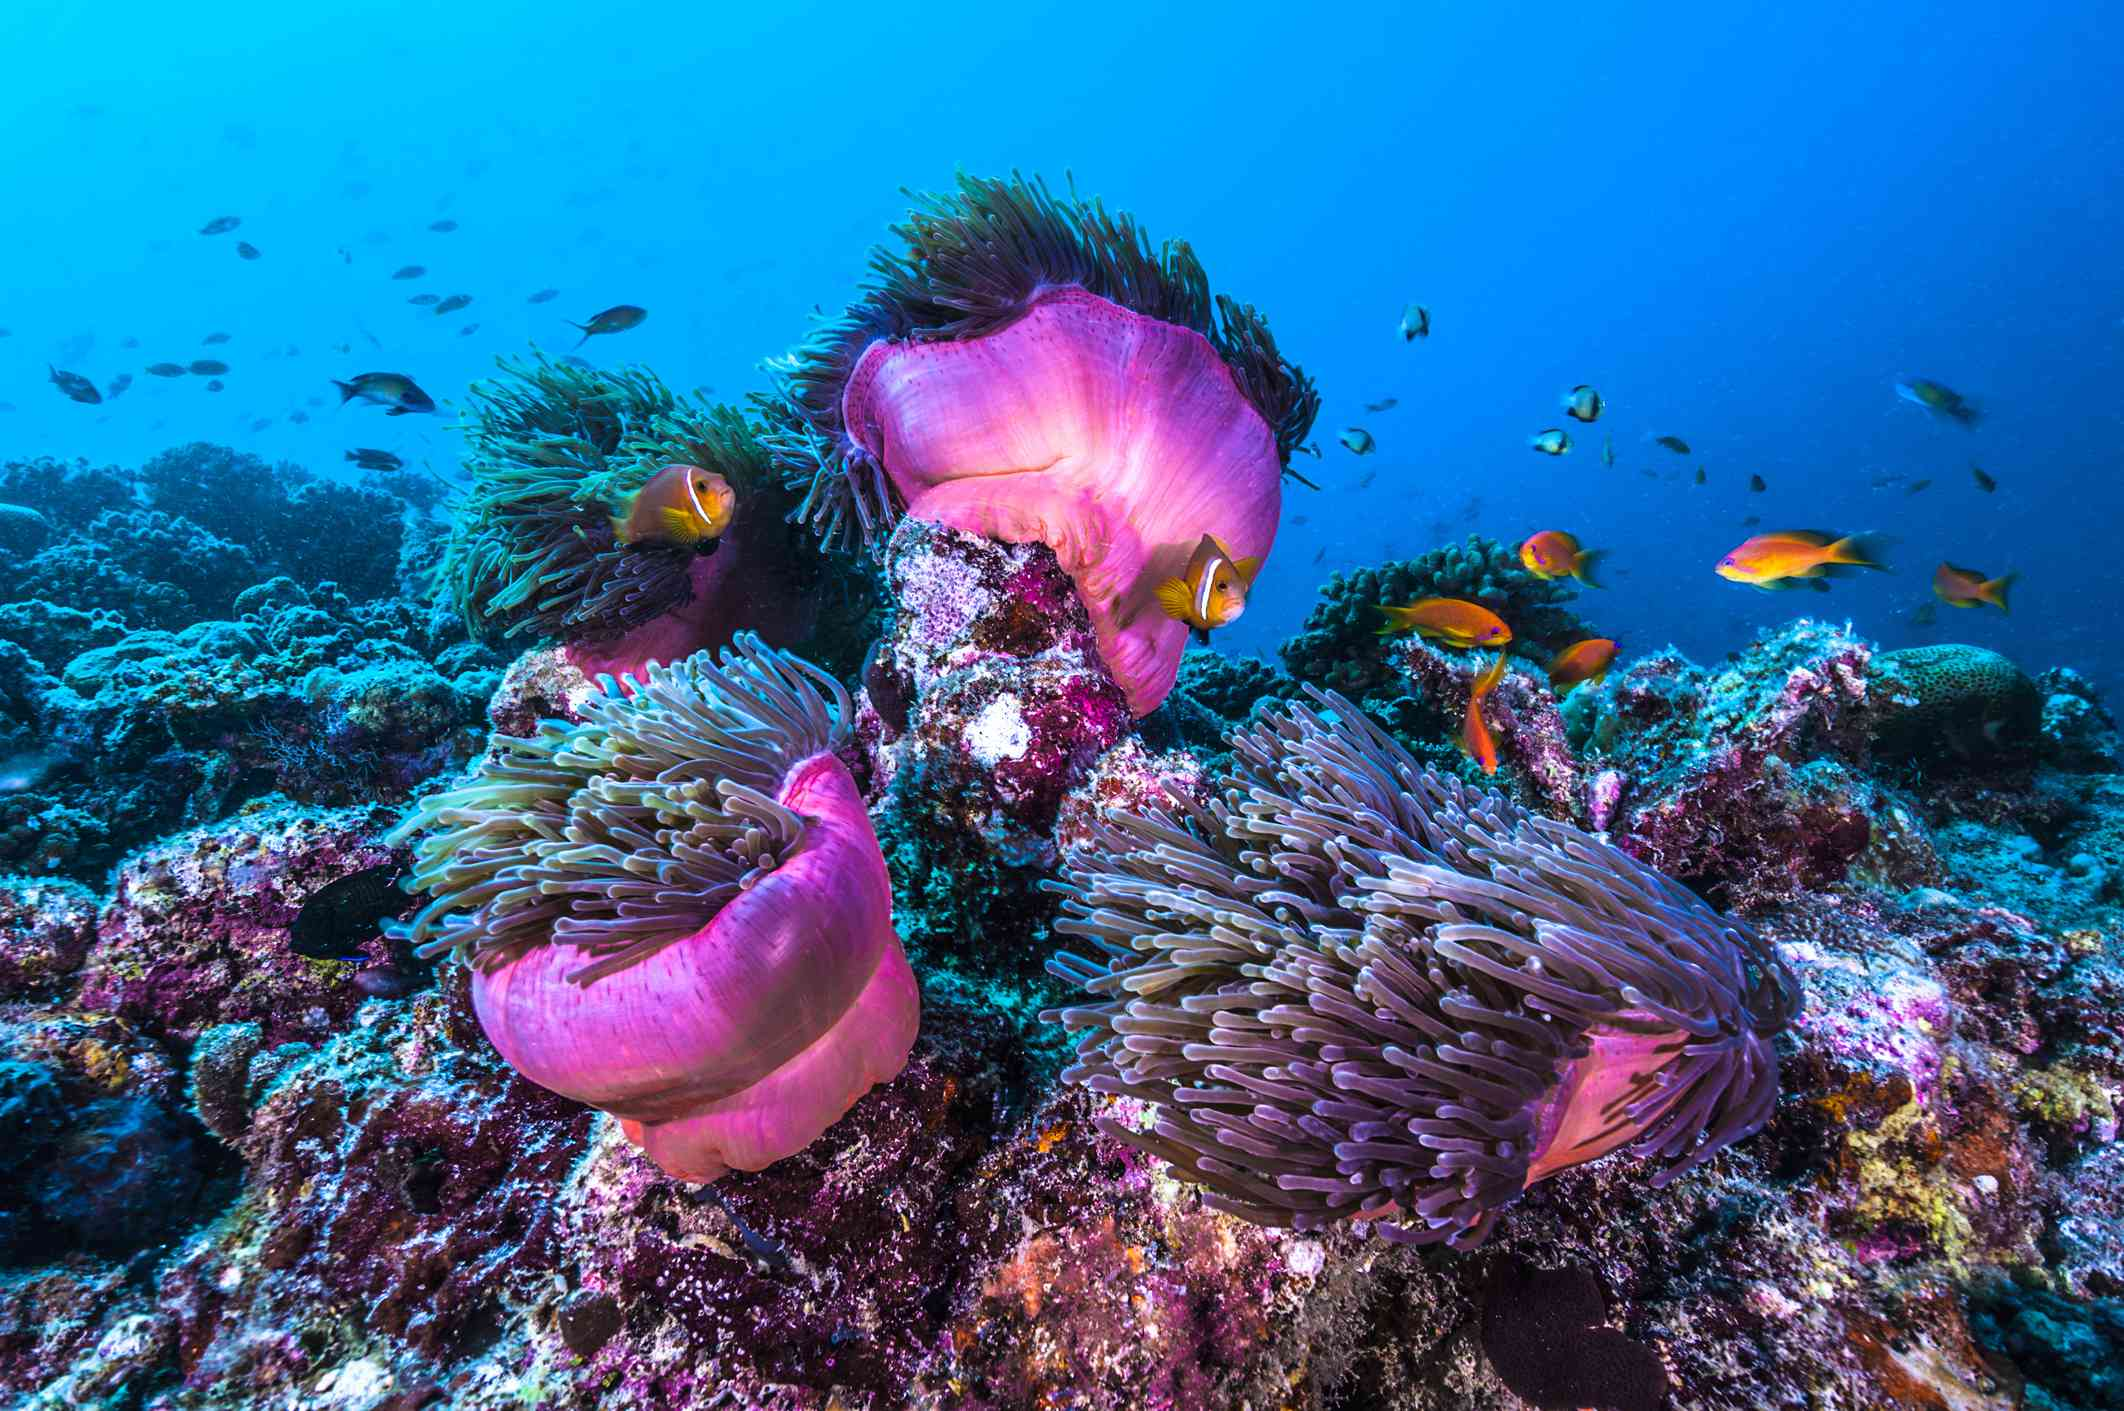 A school of fish in The Maldives